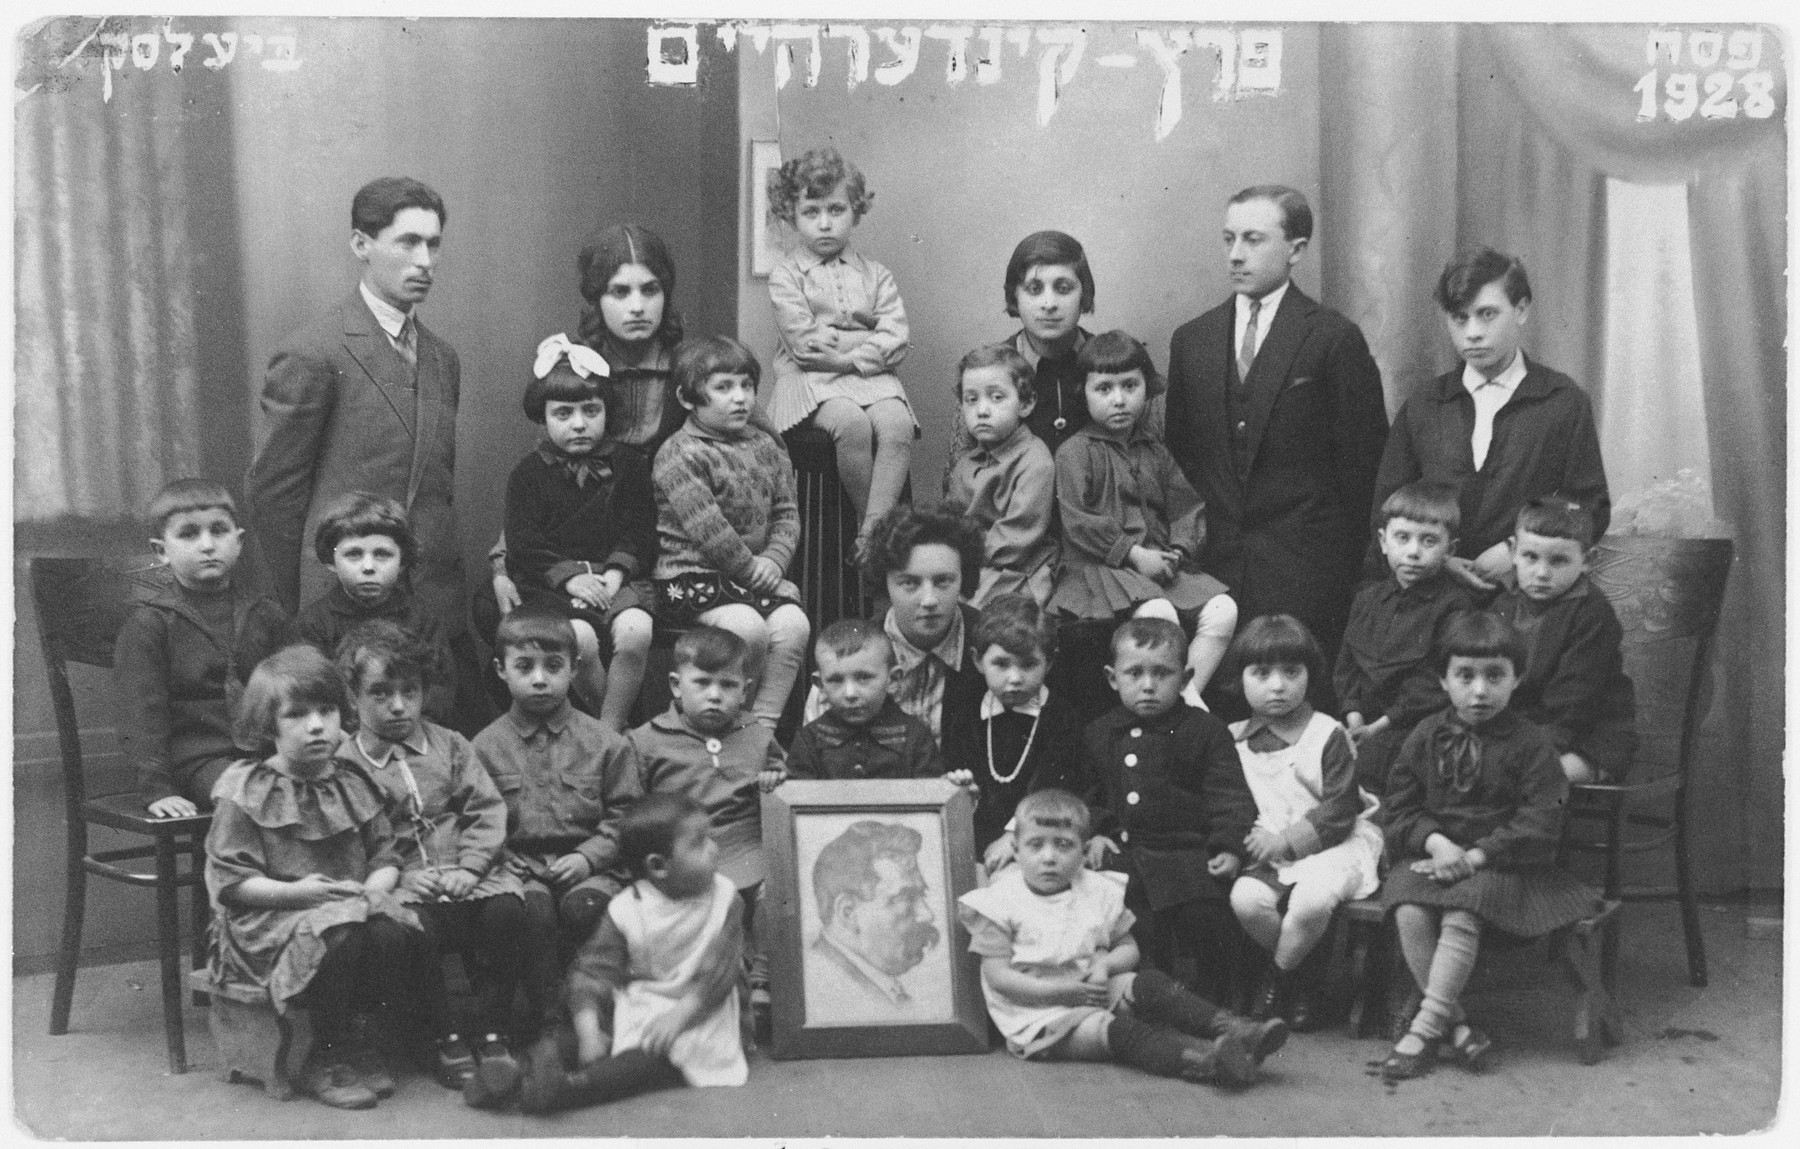 Kindergarten children and teachers in the Y.L. Peretz Yiddish school in Bielsk-Podlaski.  Seated in the center is their teacher Genia Kac.